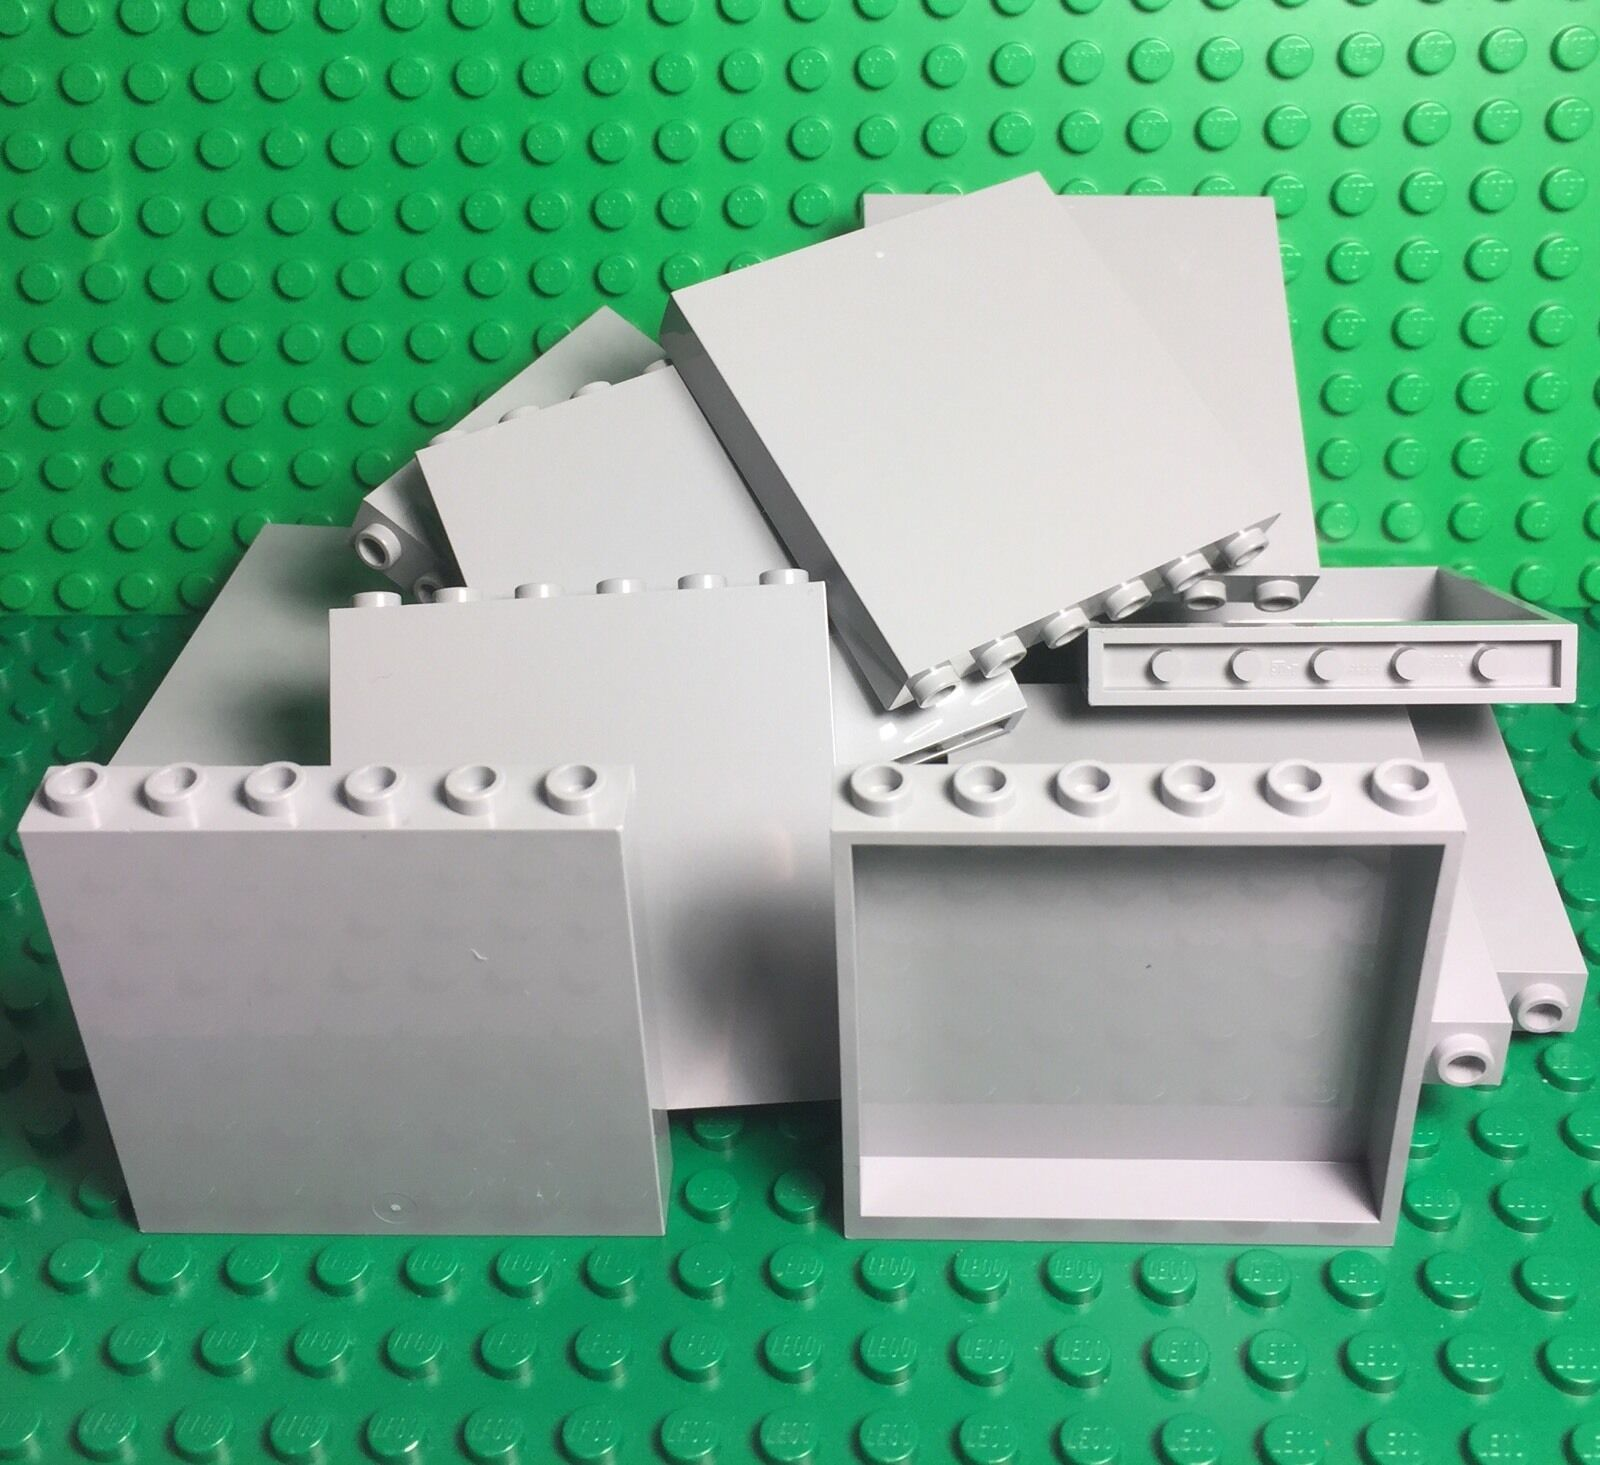 Lego X50 Bulk Light Bluish grau 1x6x5 Panel / Medium Stone grau Wall Parts Lot